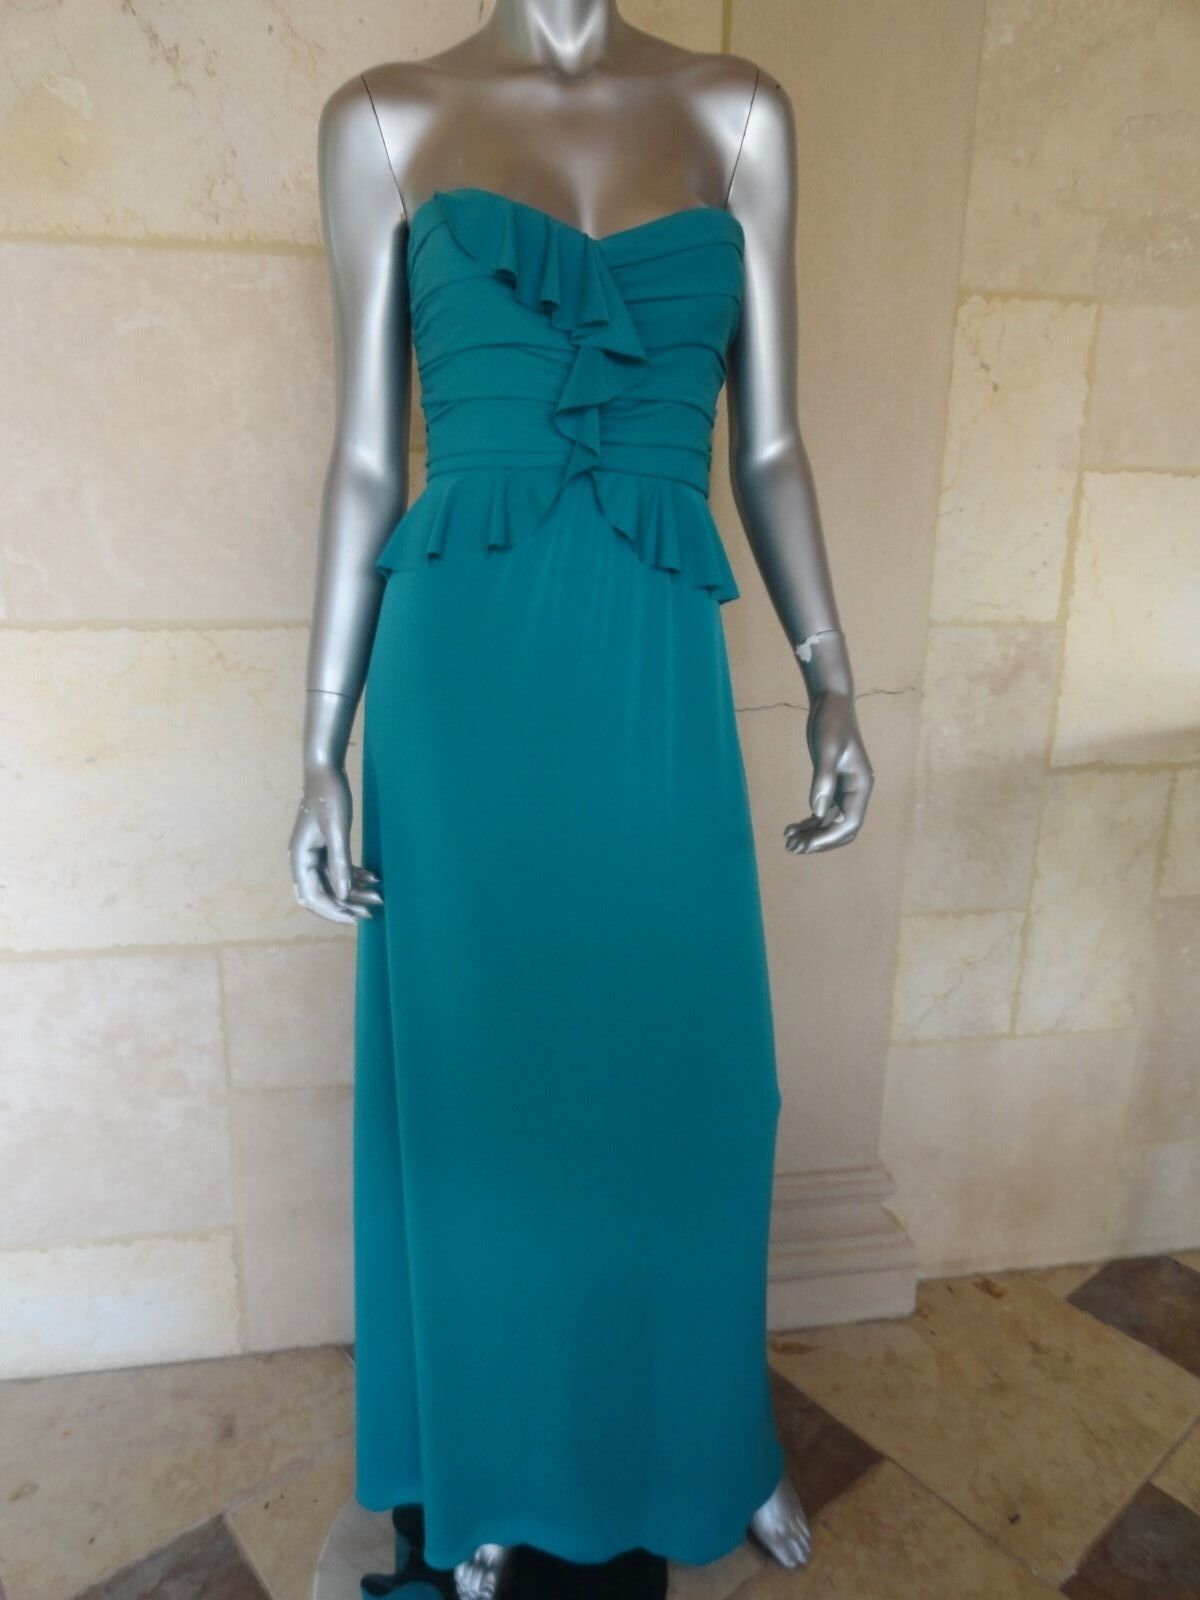 280 Amsale Green Matte Strapless Full Length Formal Evening Gown Dress Sz 8 NWT